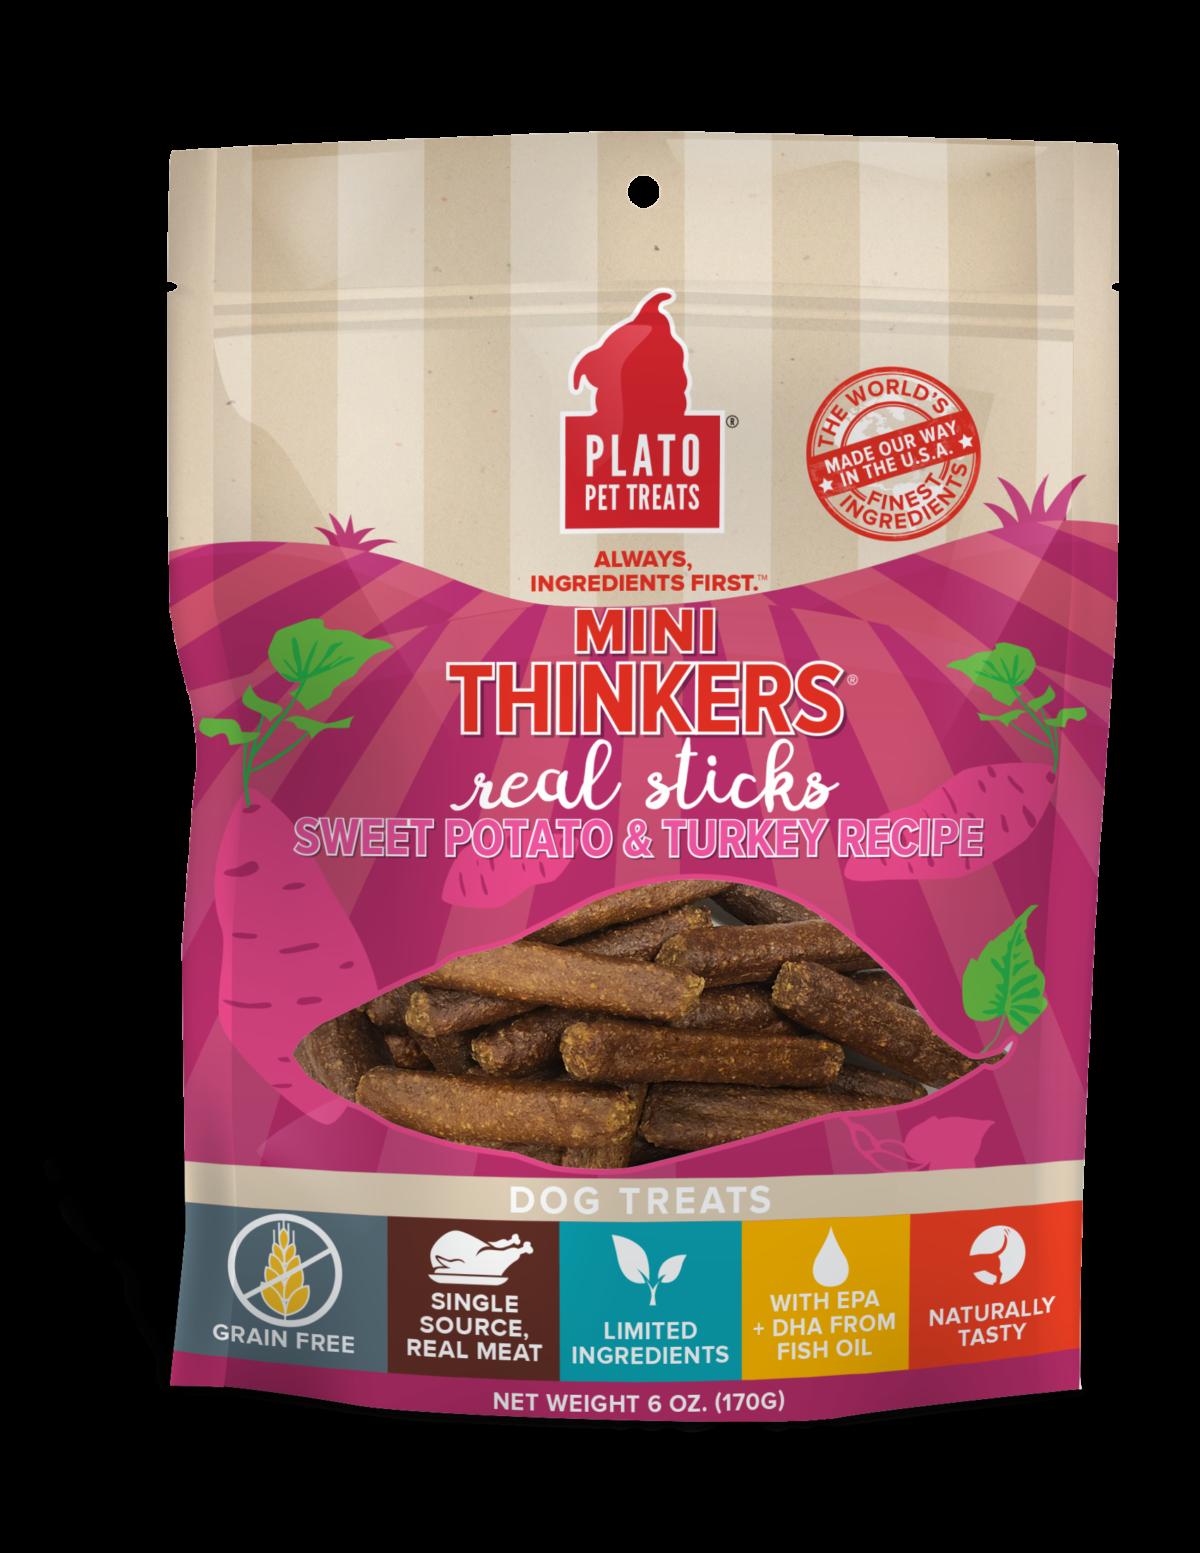 Plato Mini Thinkers Sweet Potato & Turkey Meat Stick Dog Treats, 6-oz